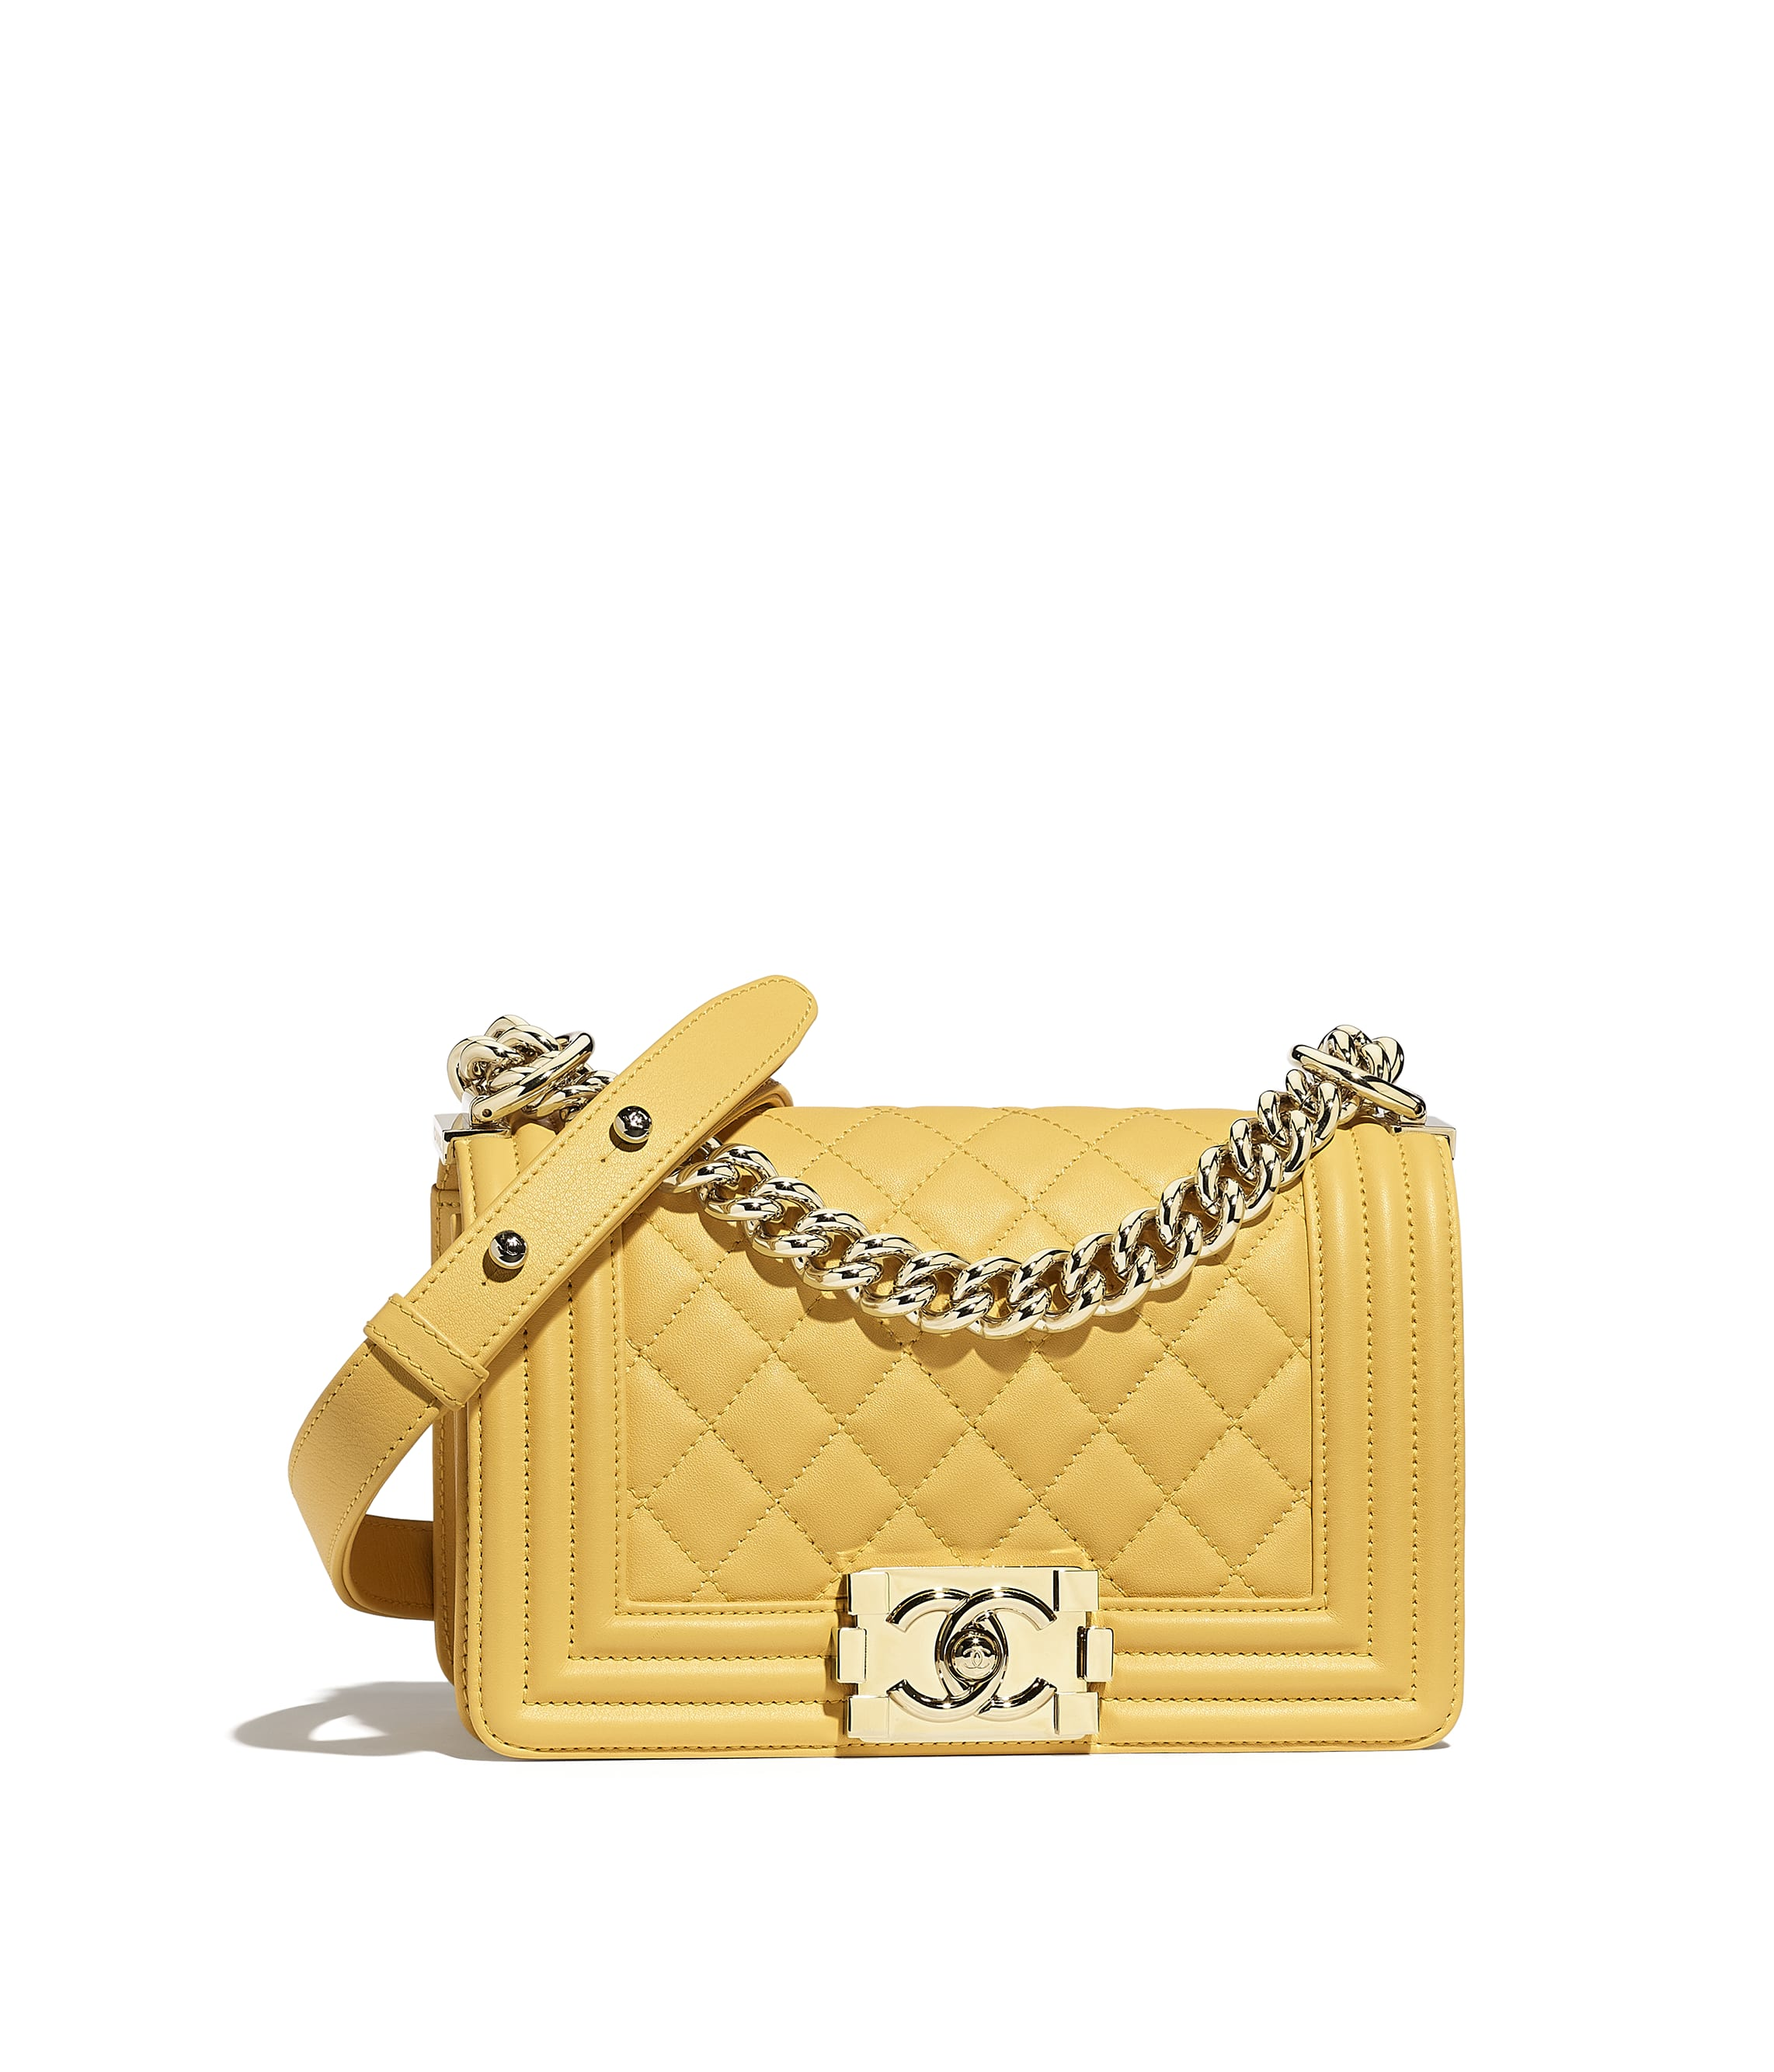 588b133994 Small BOY CHANEL Handbag. Calfskin   Gold-Tone Metal